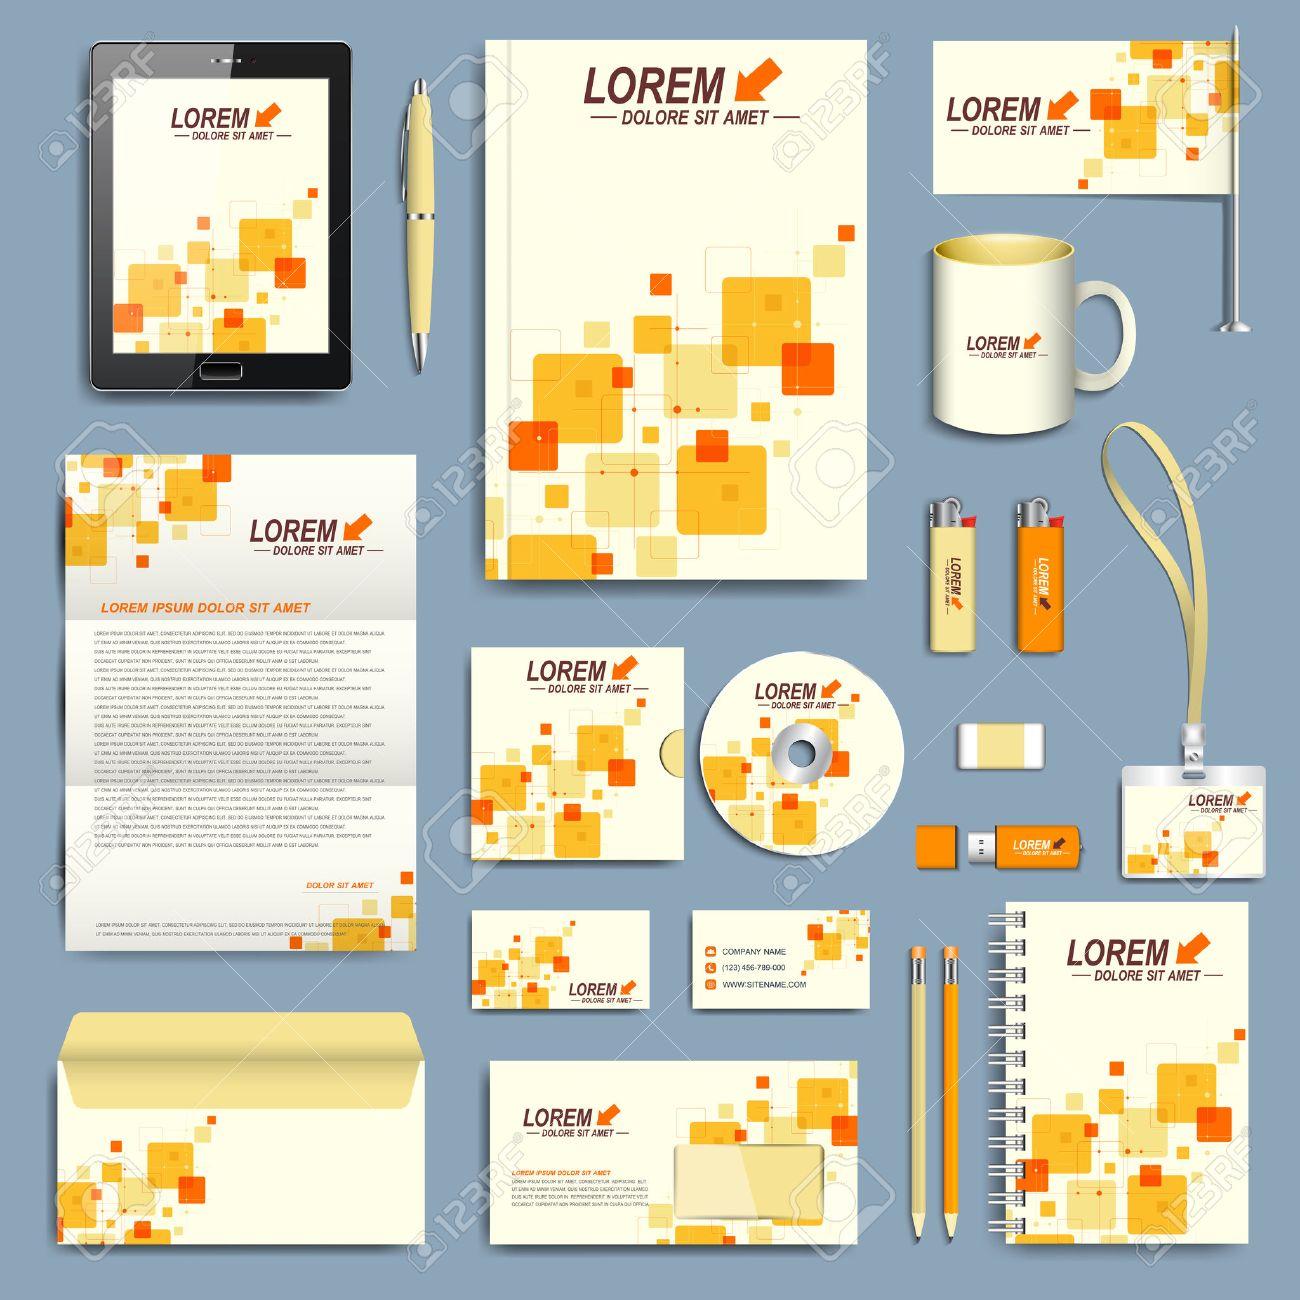 free product flyer templates psd catalogue 53 psd illustrator eps – Free Product Flyer Templates